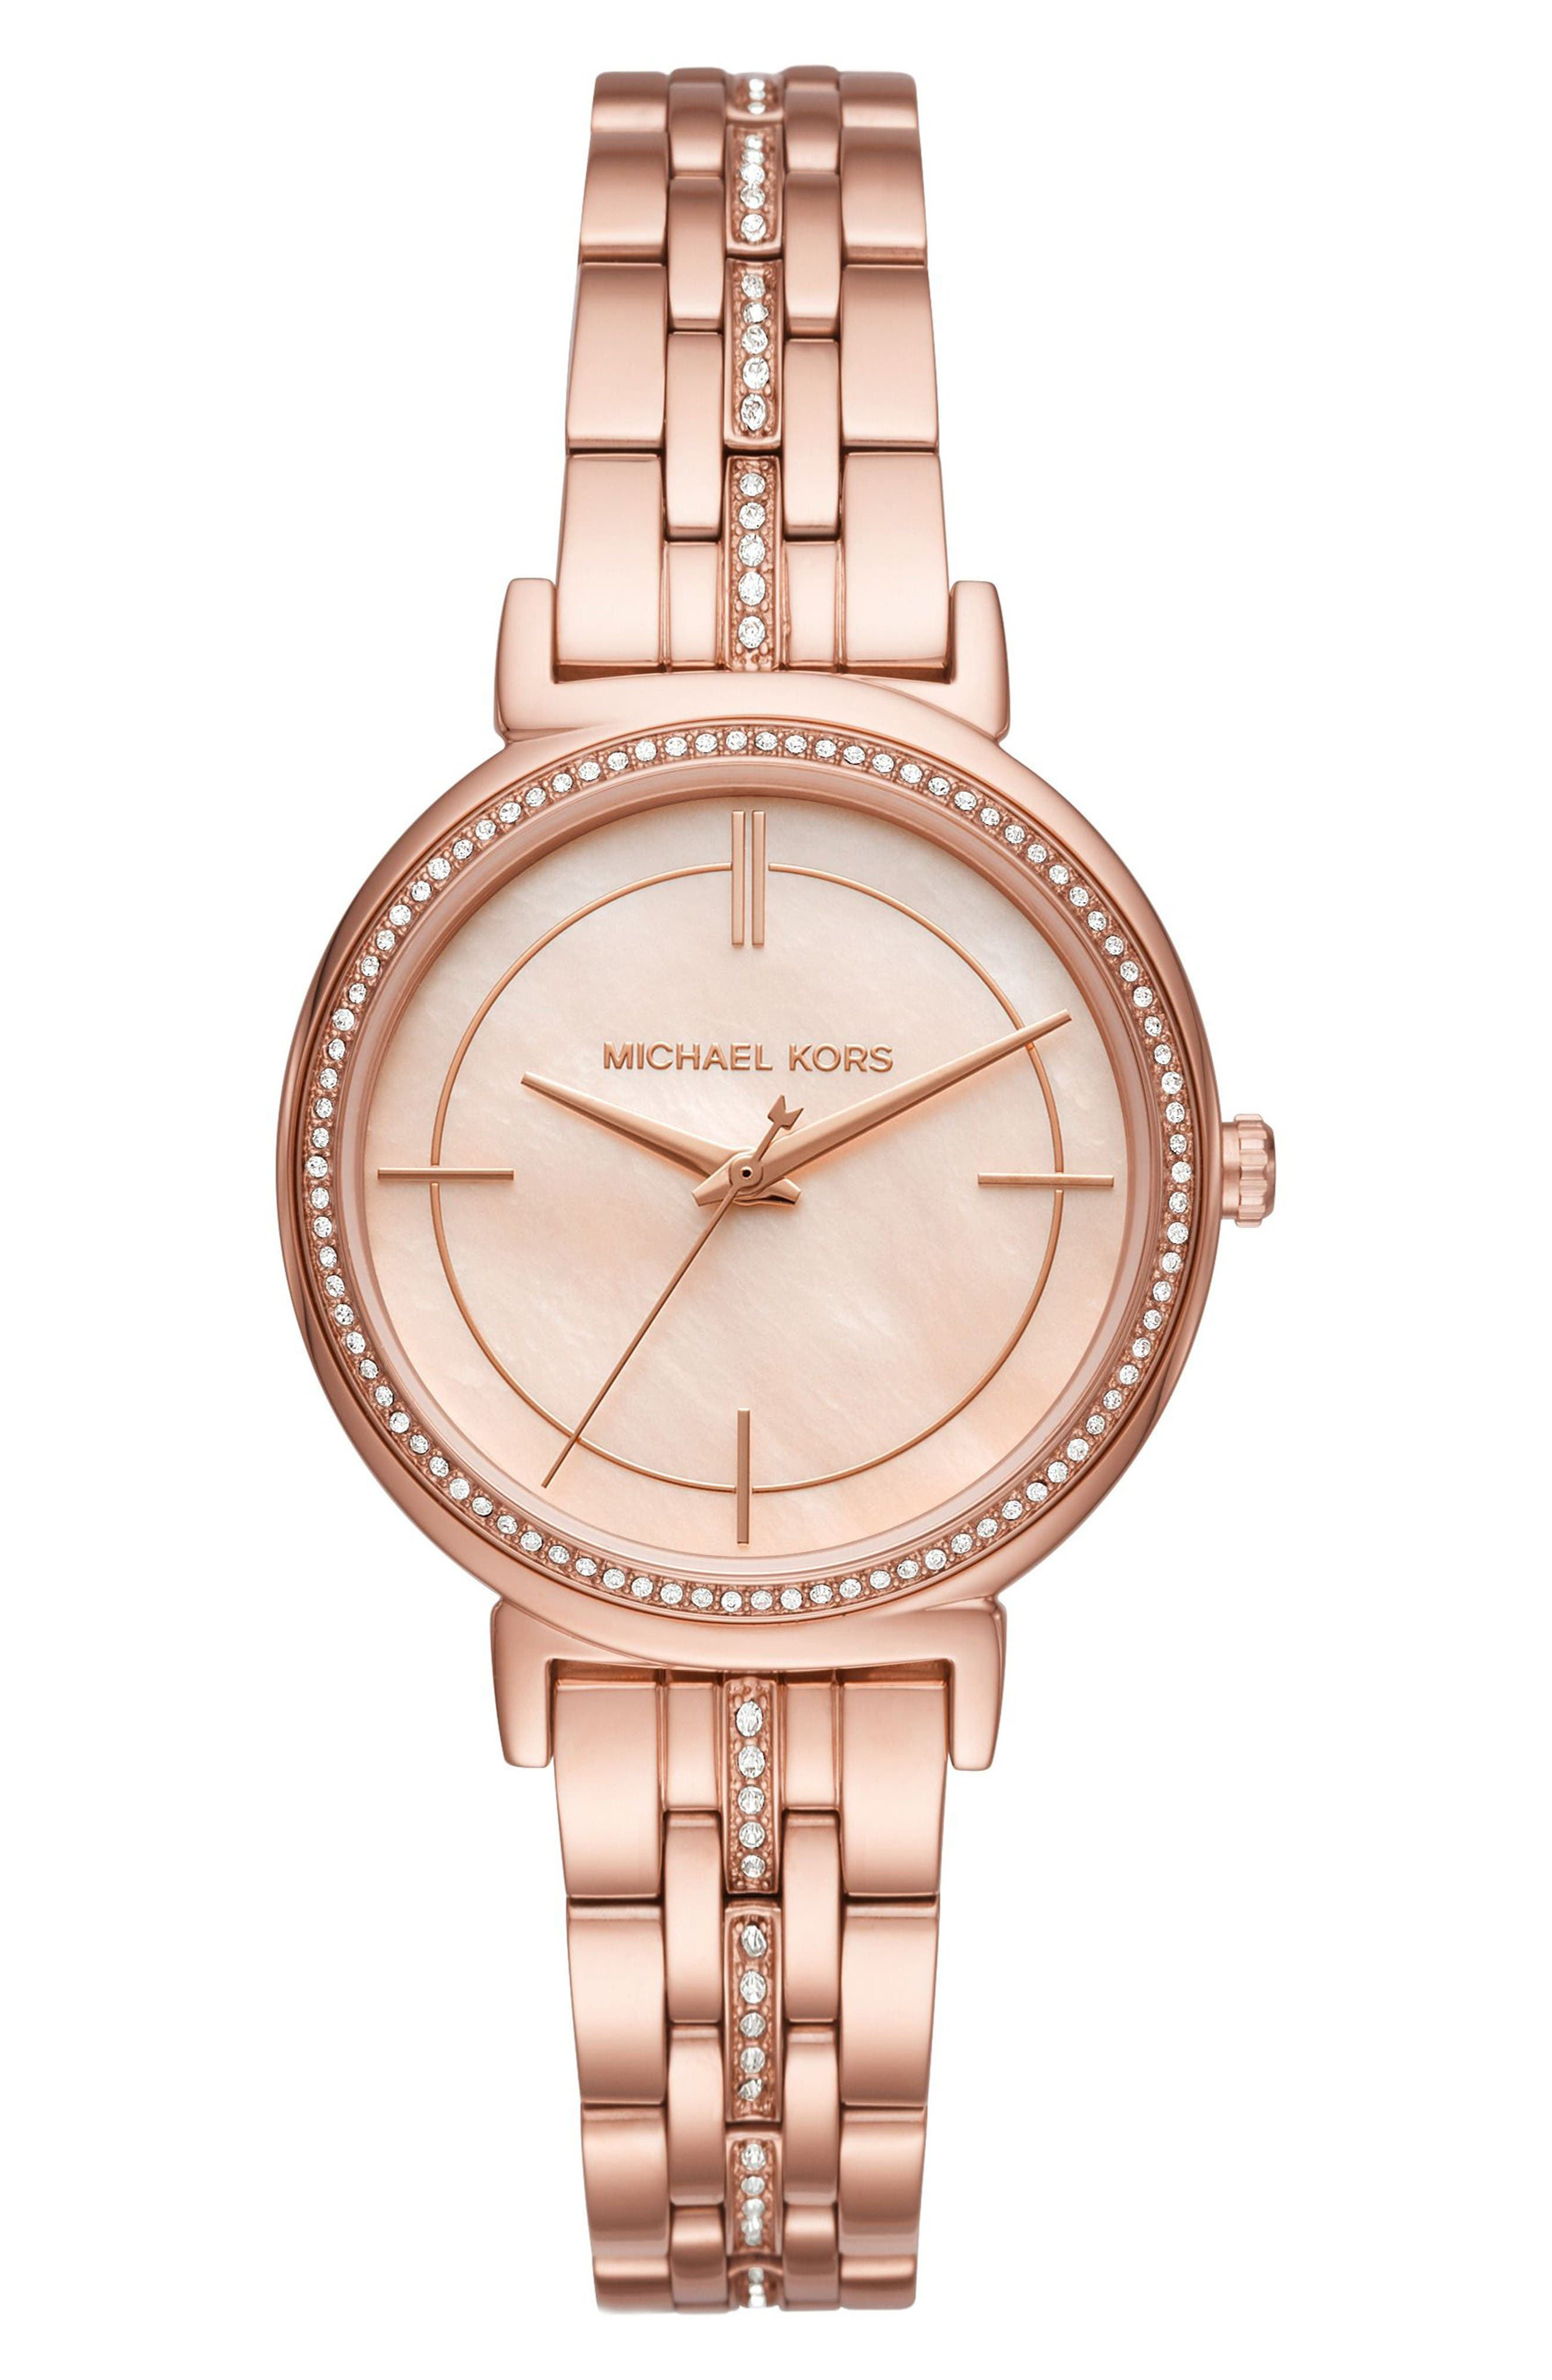 Main Image - Michael Kors Cinthia Bracelet Watch, 33mm